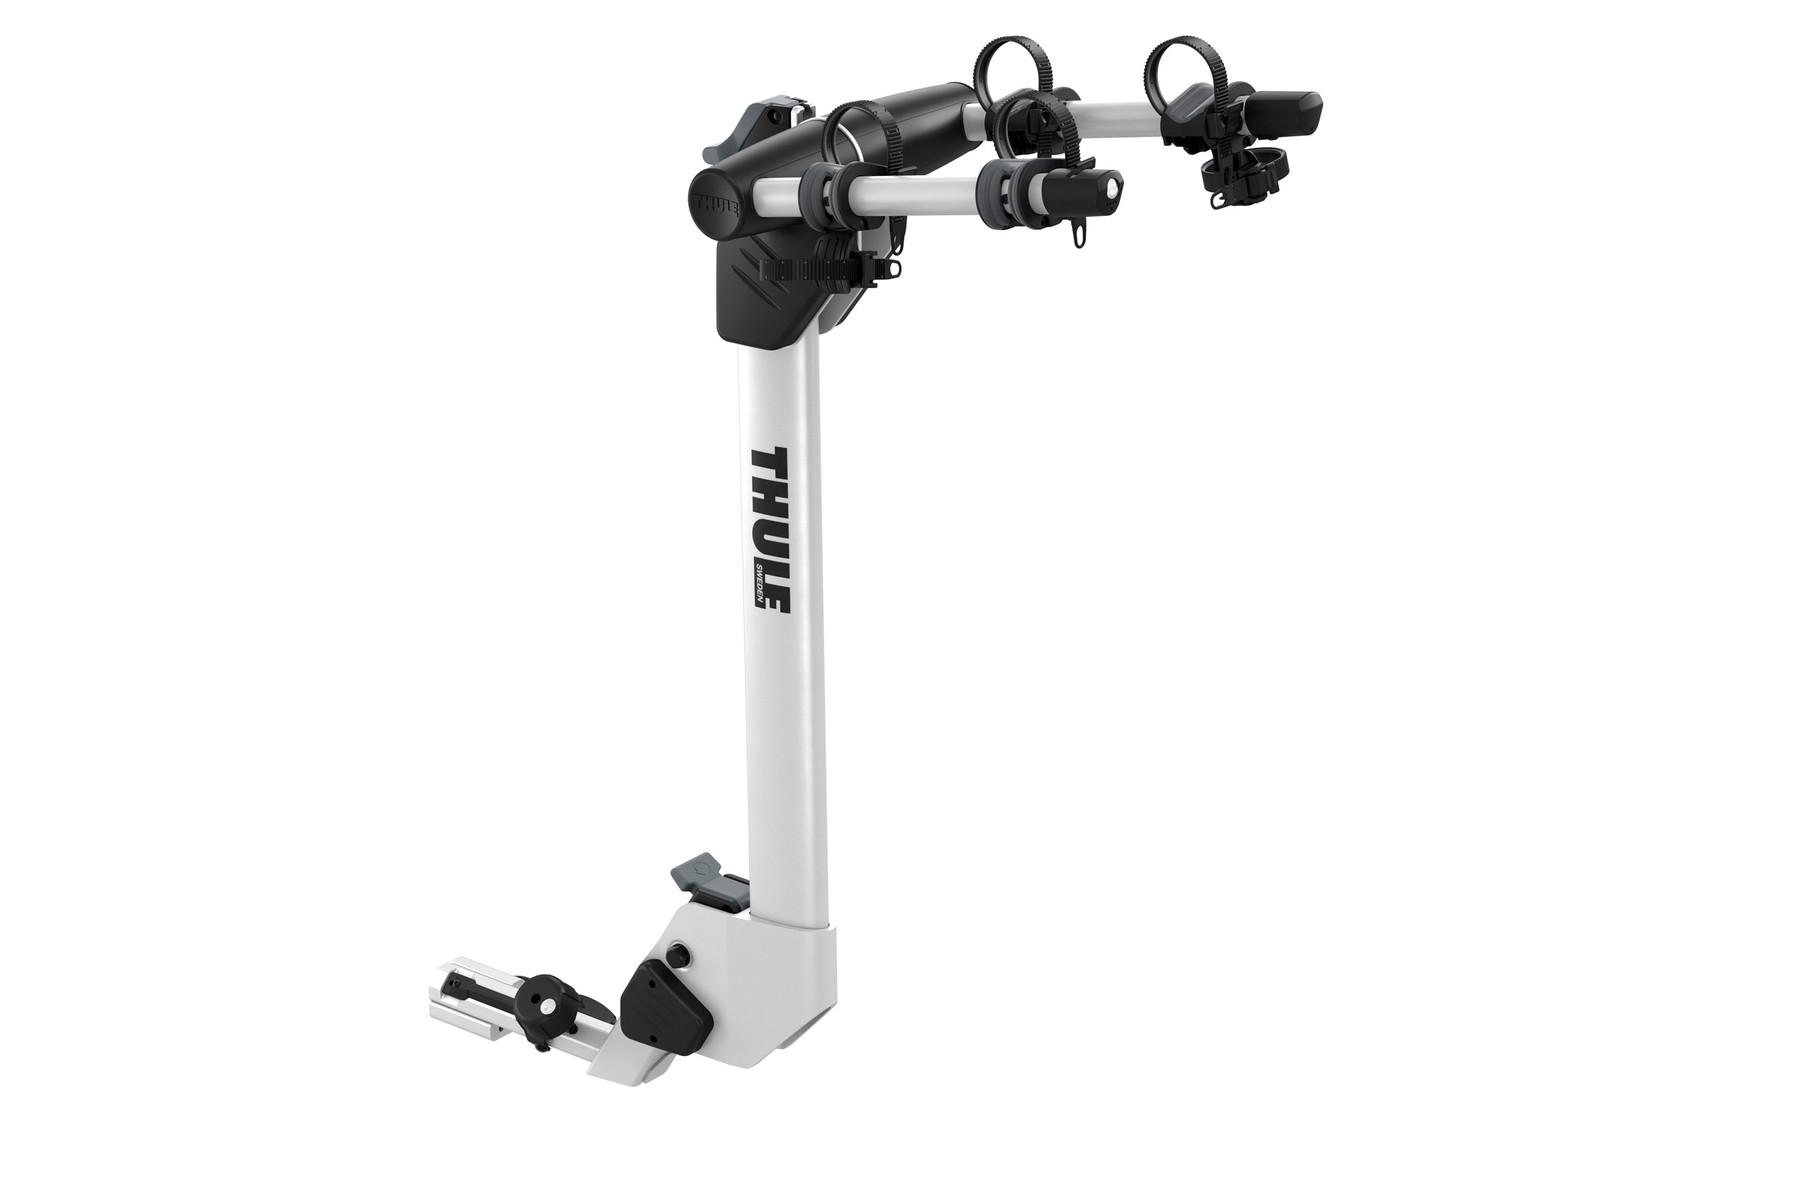 Thule Hanging Style Bike Rack - Thule Helium Pro 2